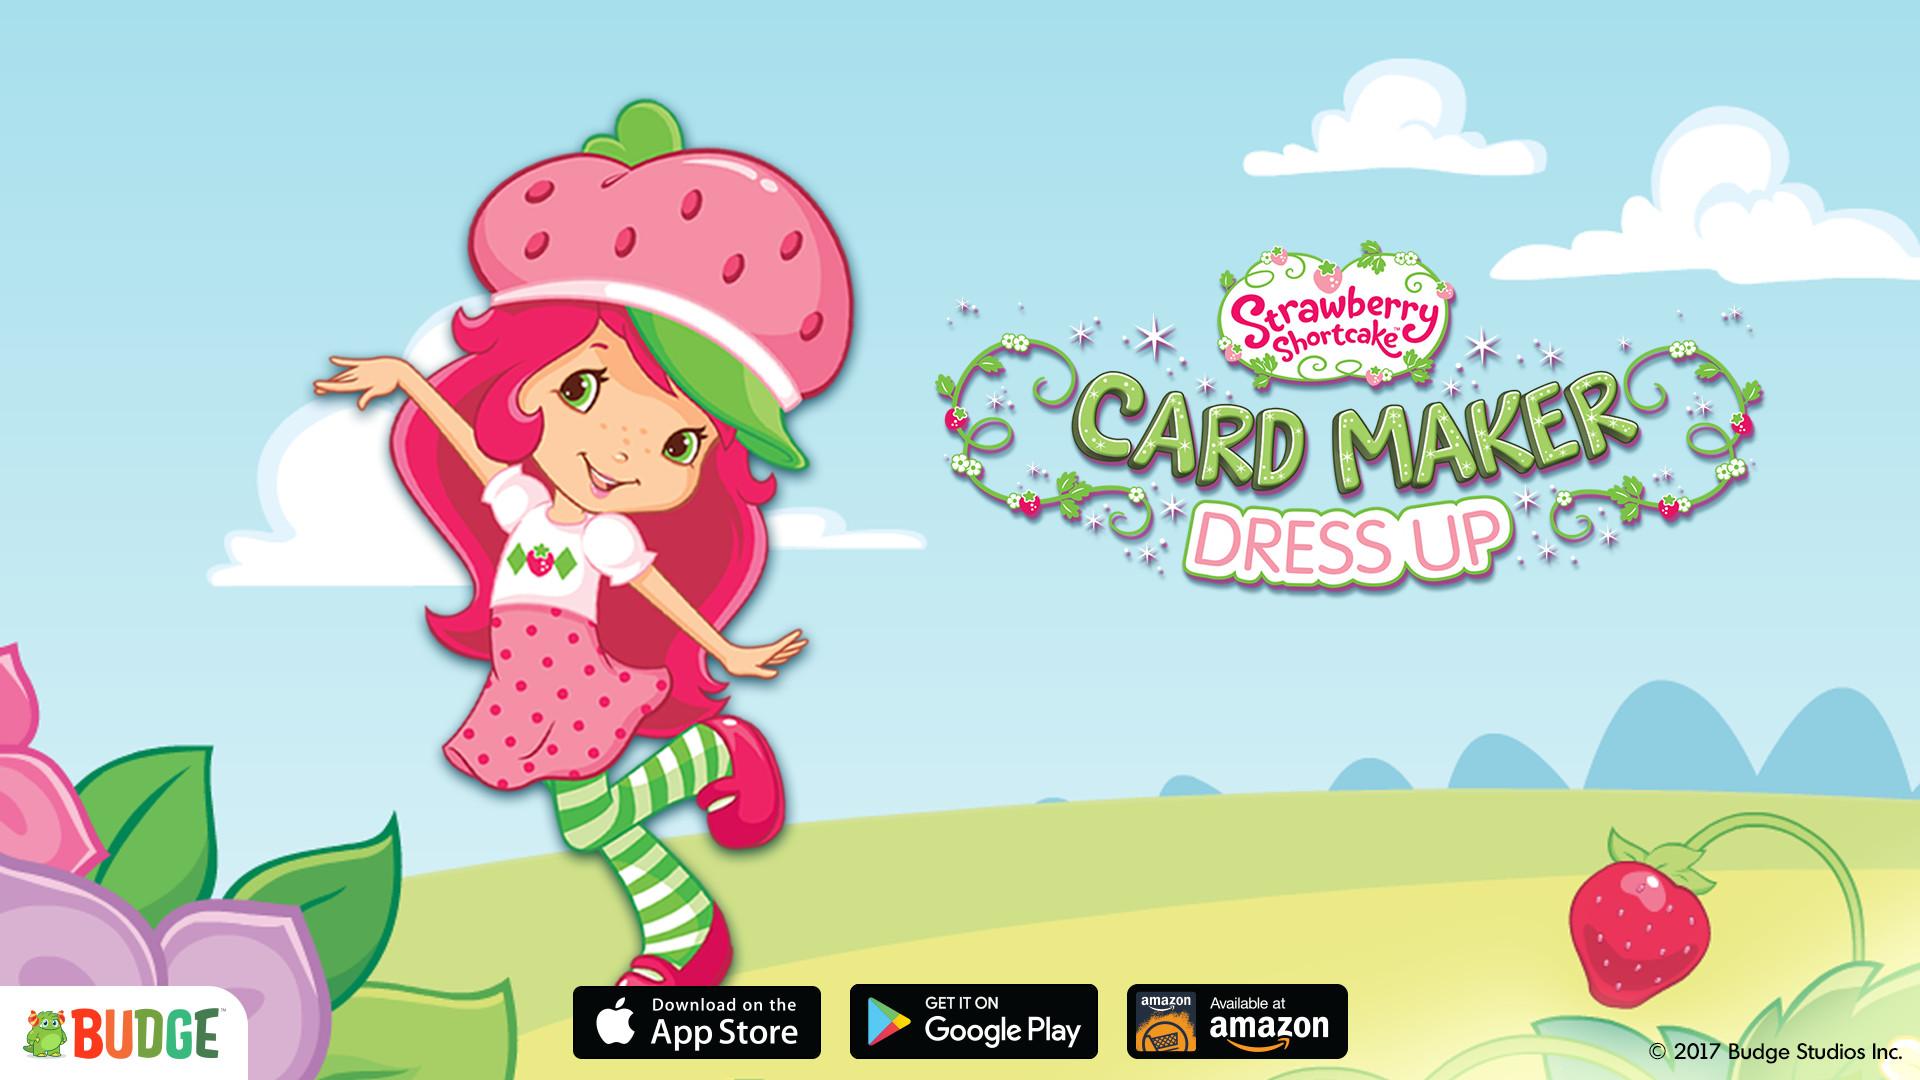 Strawberry Shortcake Backgrounds 183 ① Wallpapertag